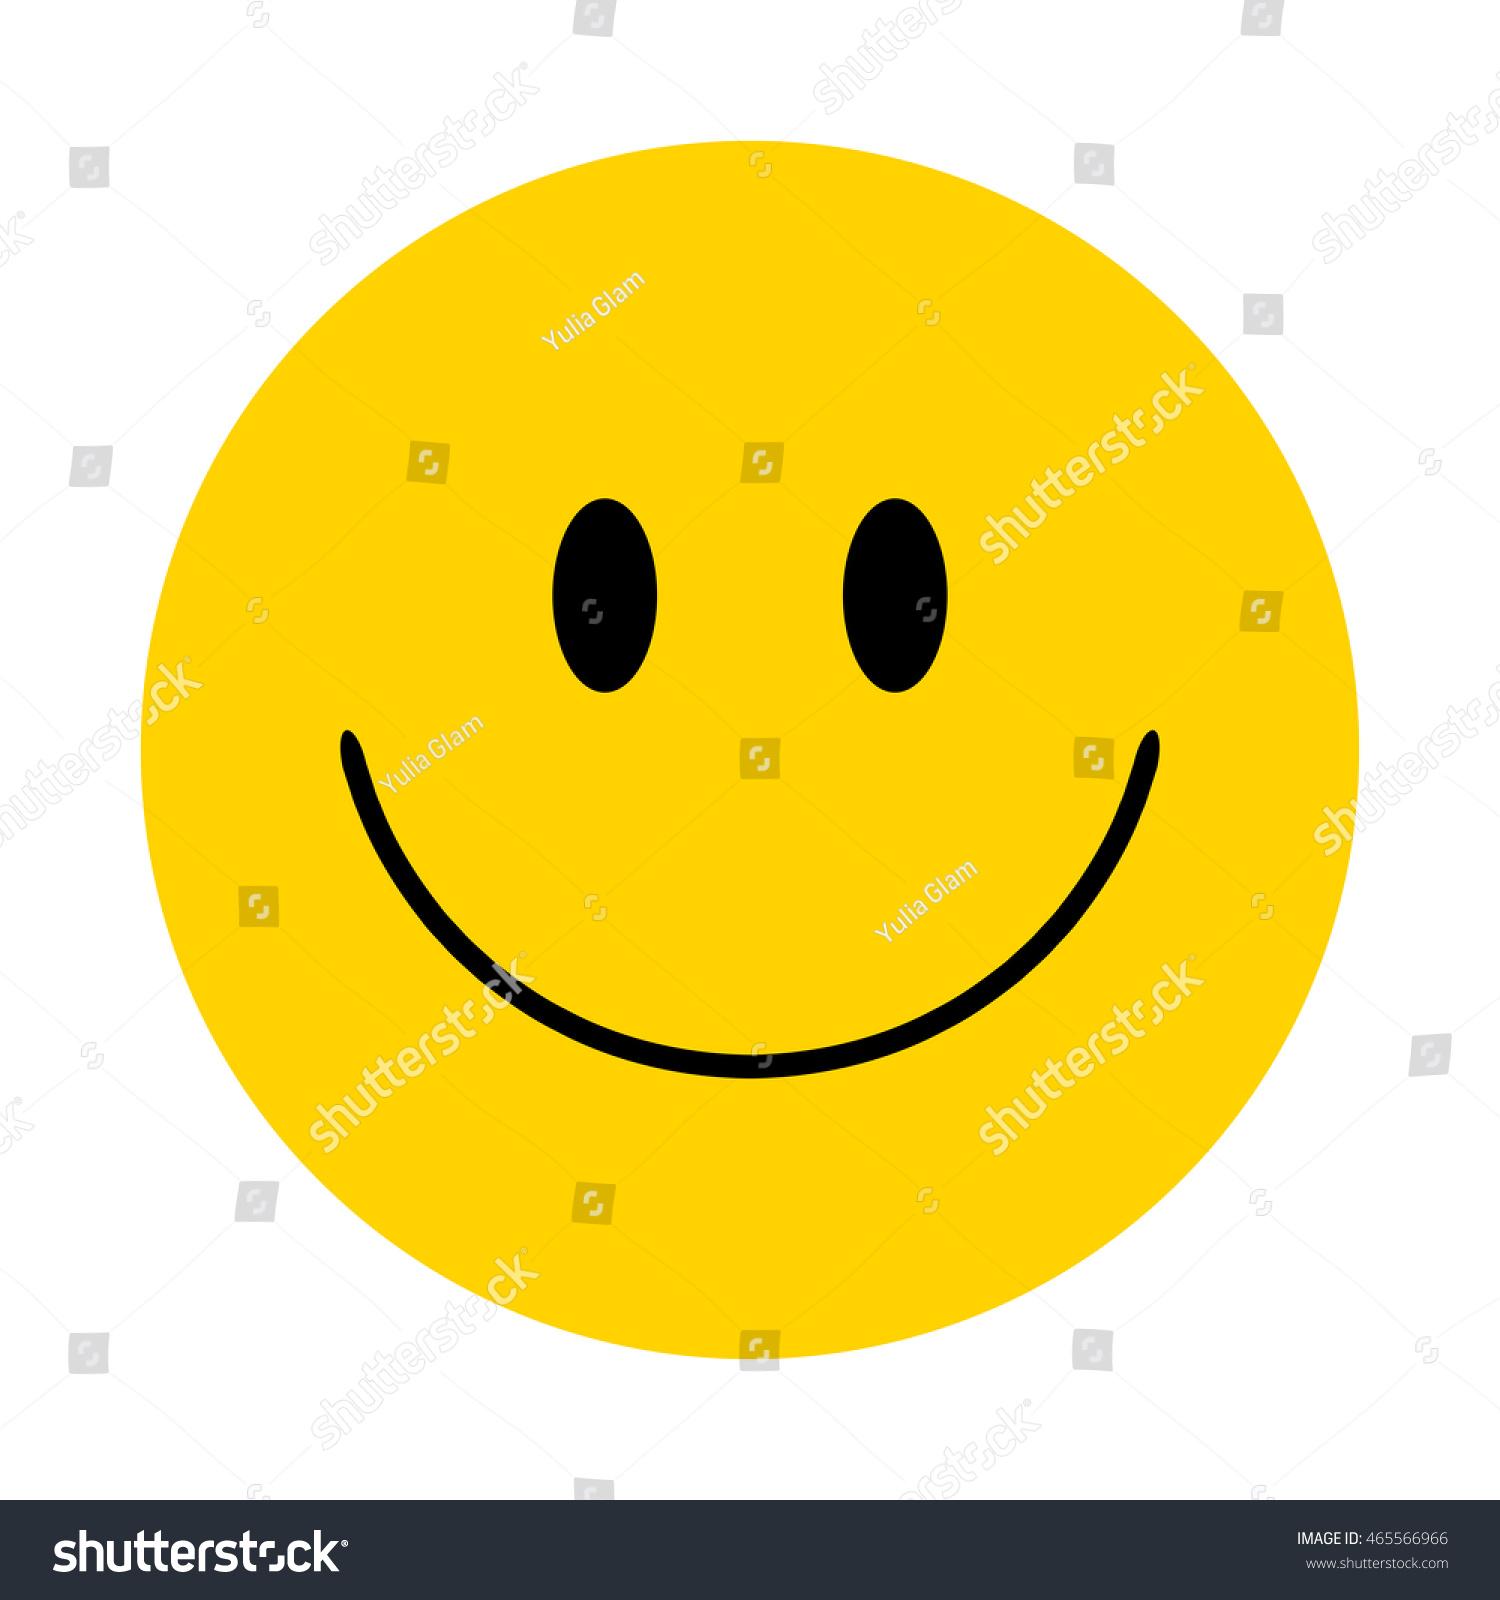 smiley vector Sad Face Vector vector smiley face emoji with tongue out